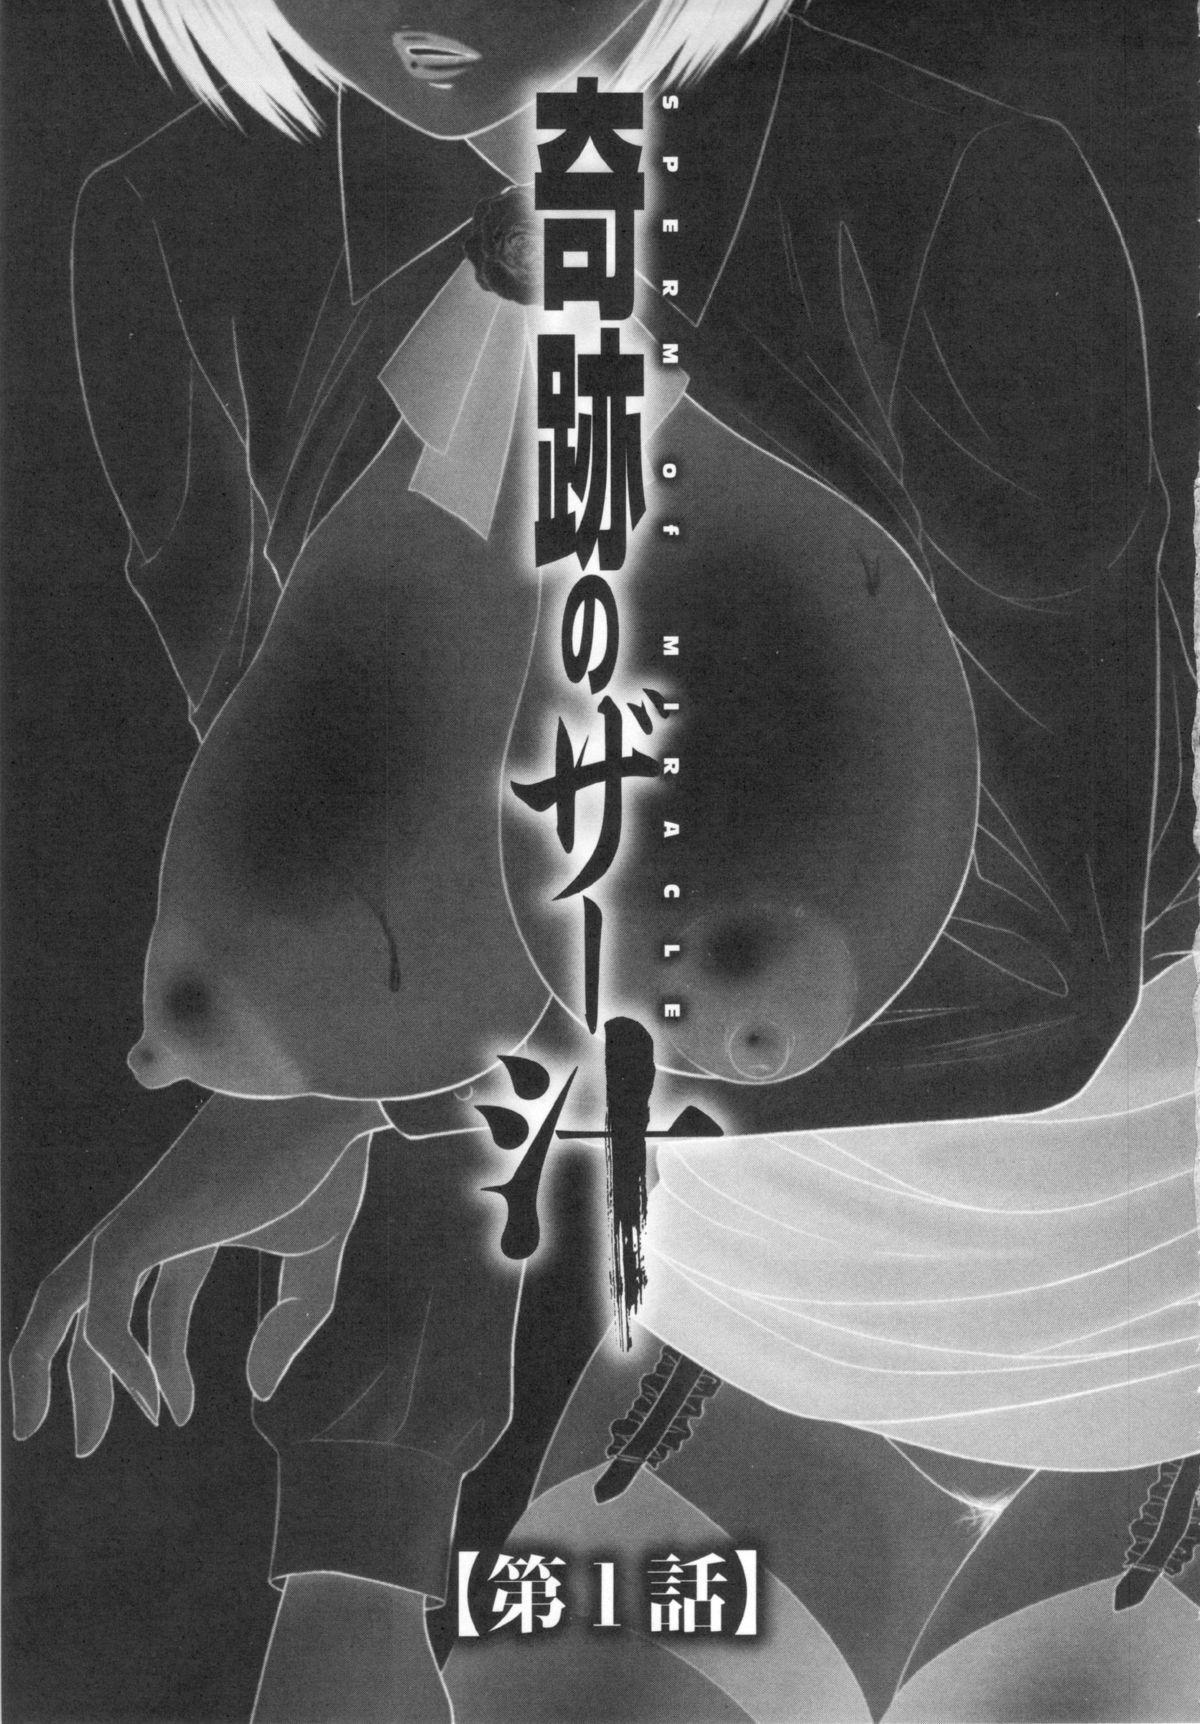 Kiseki No Zaajiru - Sperm of Miracle 5